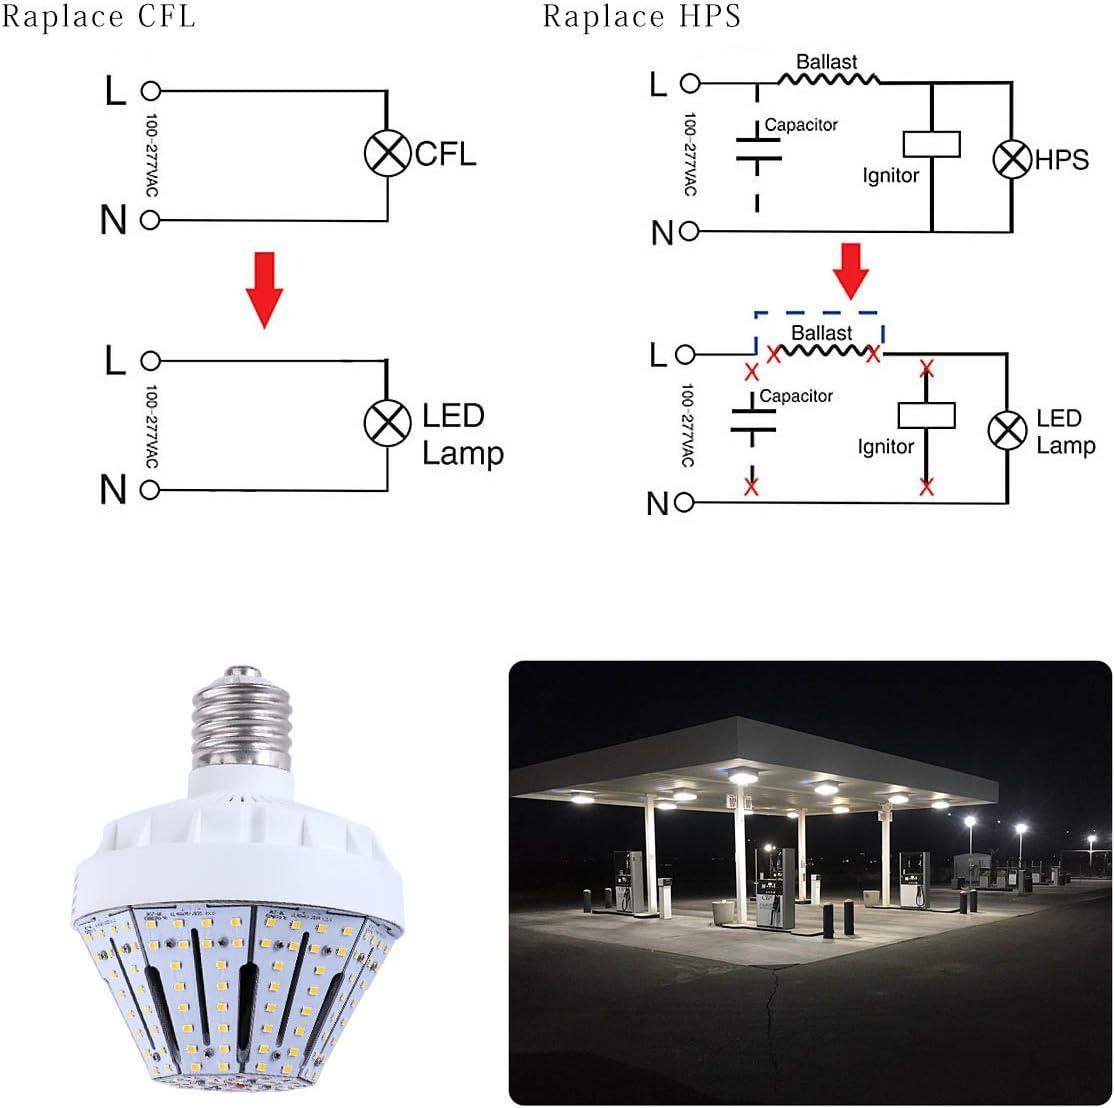 50W Led Corn Light Bulb 4000K UL-Listed /& DLC Mogul Base E39 Led Bulb 7600 Lumens Replacement for 300W-500W Metal Halide//HID//CFL//HPS in LED Street Lighting High Bay Garage Lights Warehouse Lighting